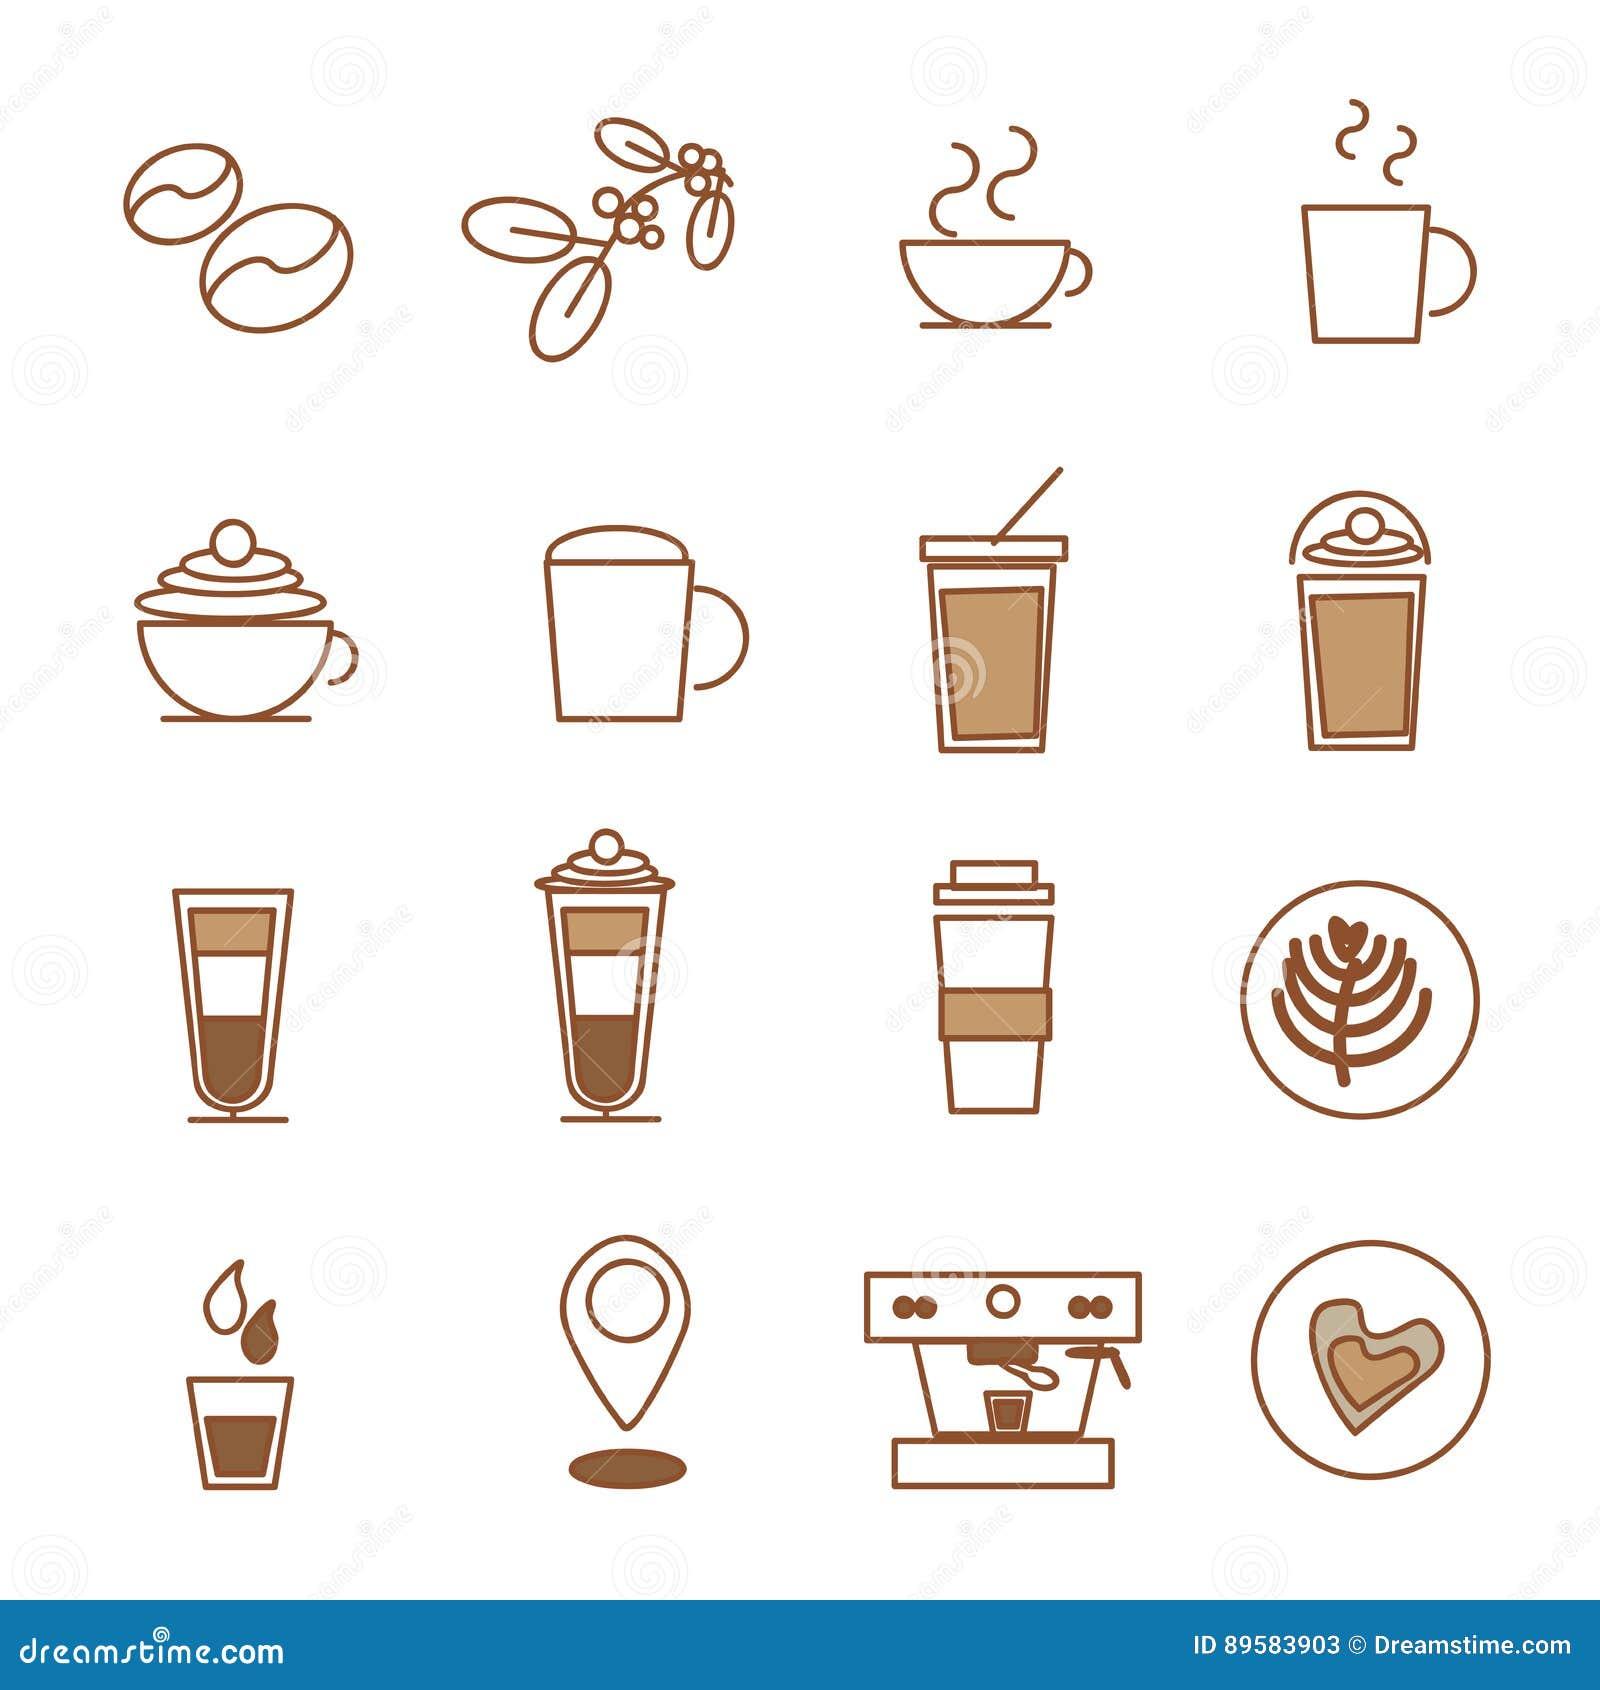 Coffee icon set , coffee bean coffee shop